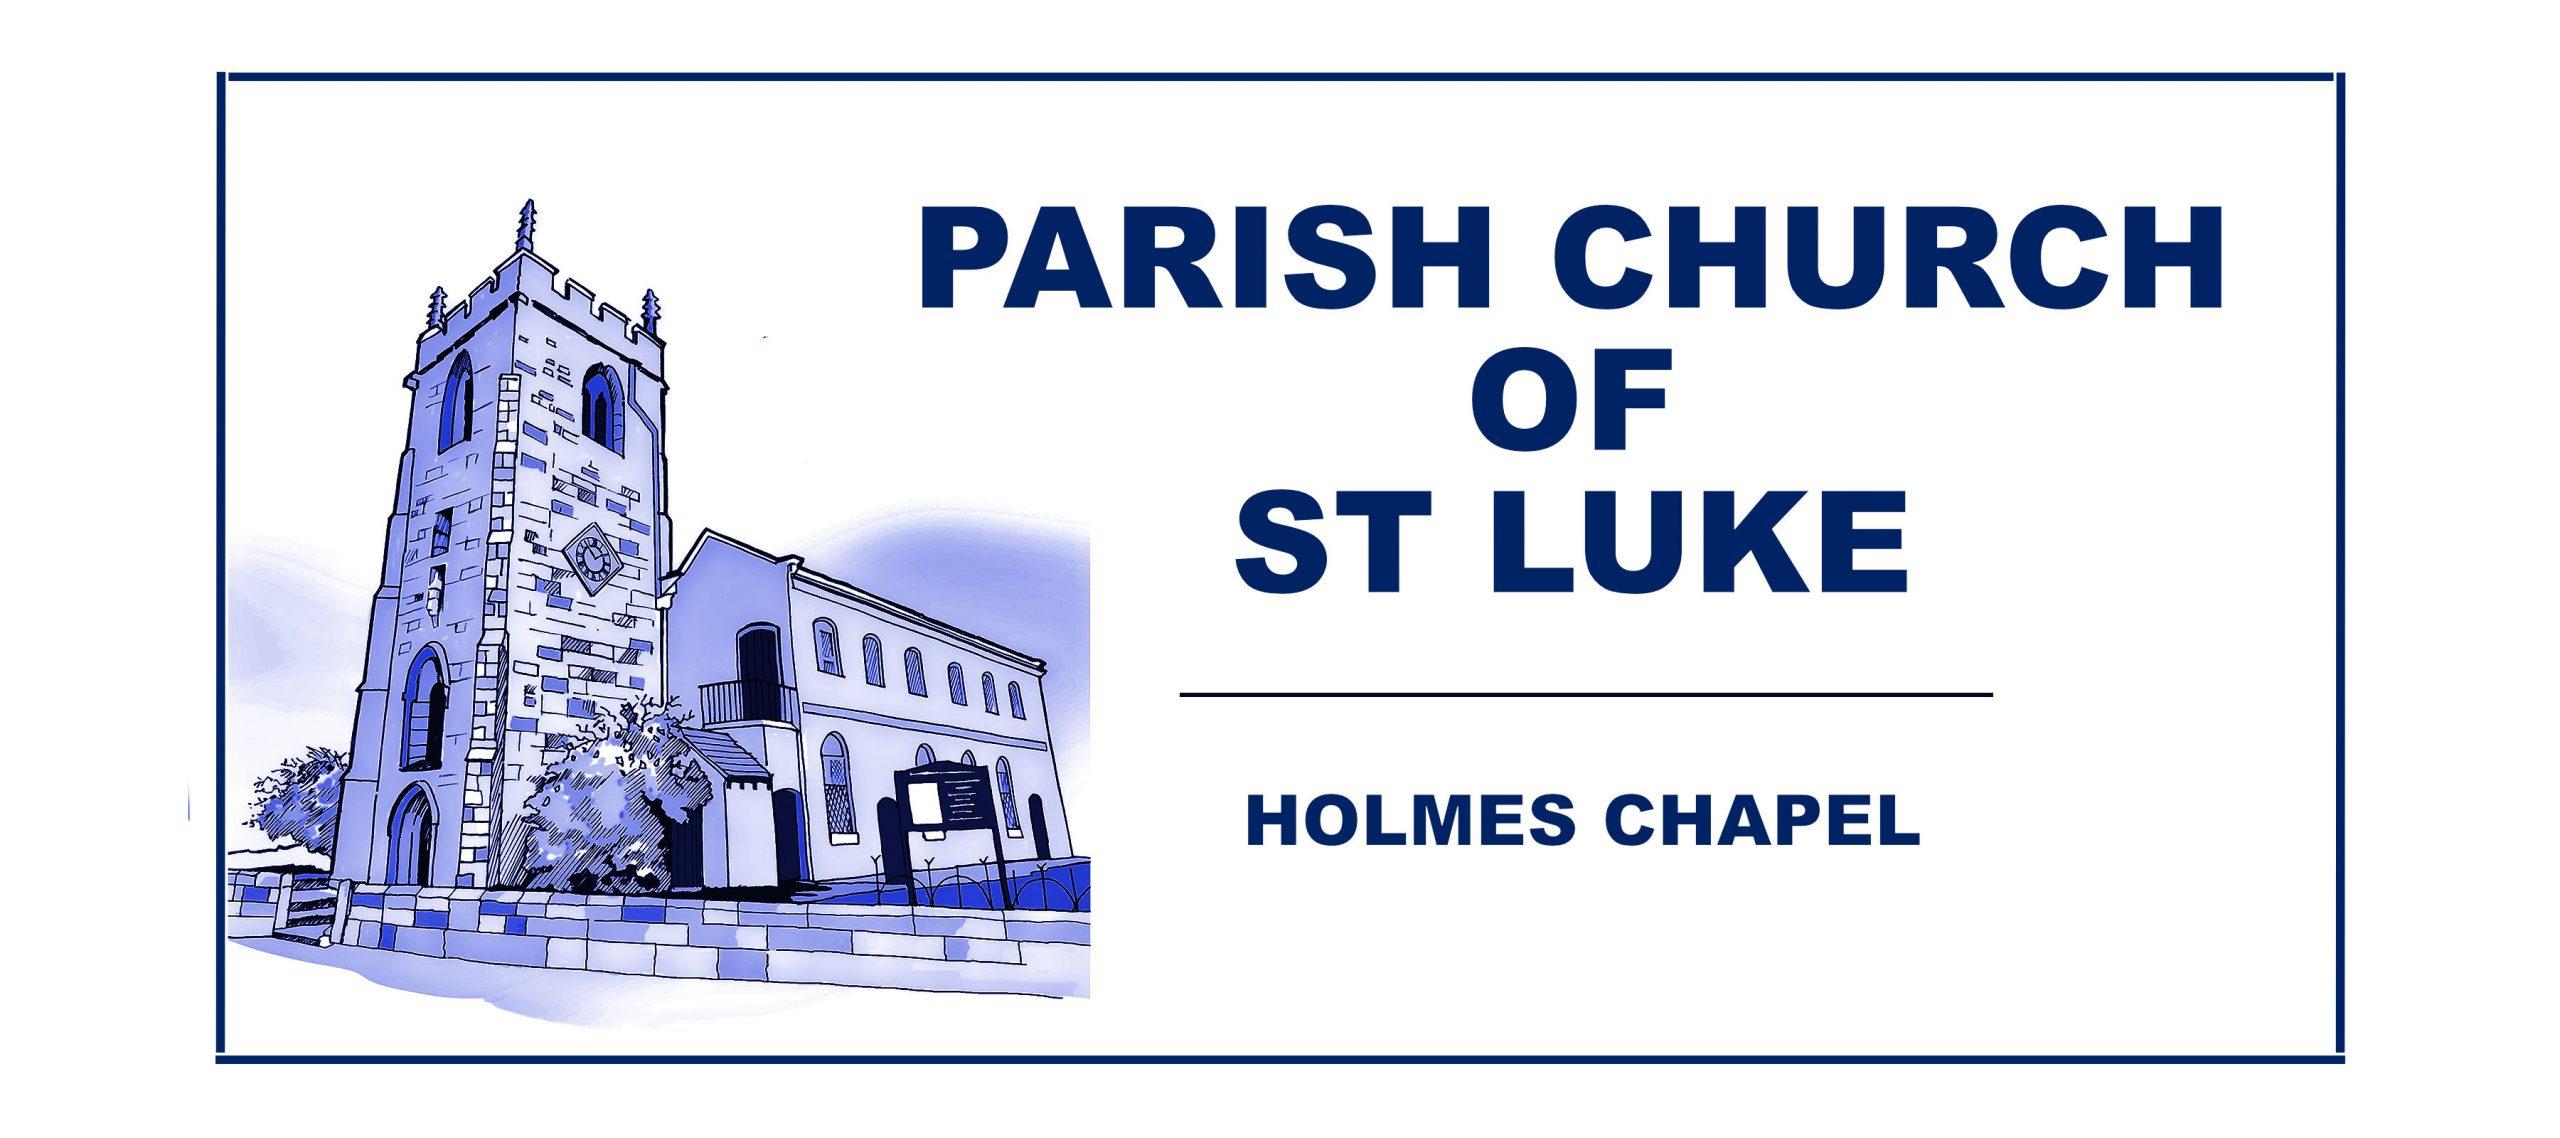 Parish Church of St Luke Holmes Chapel